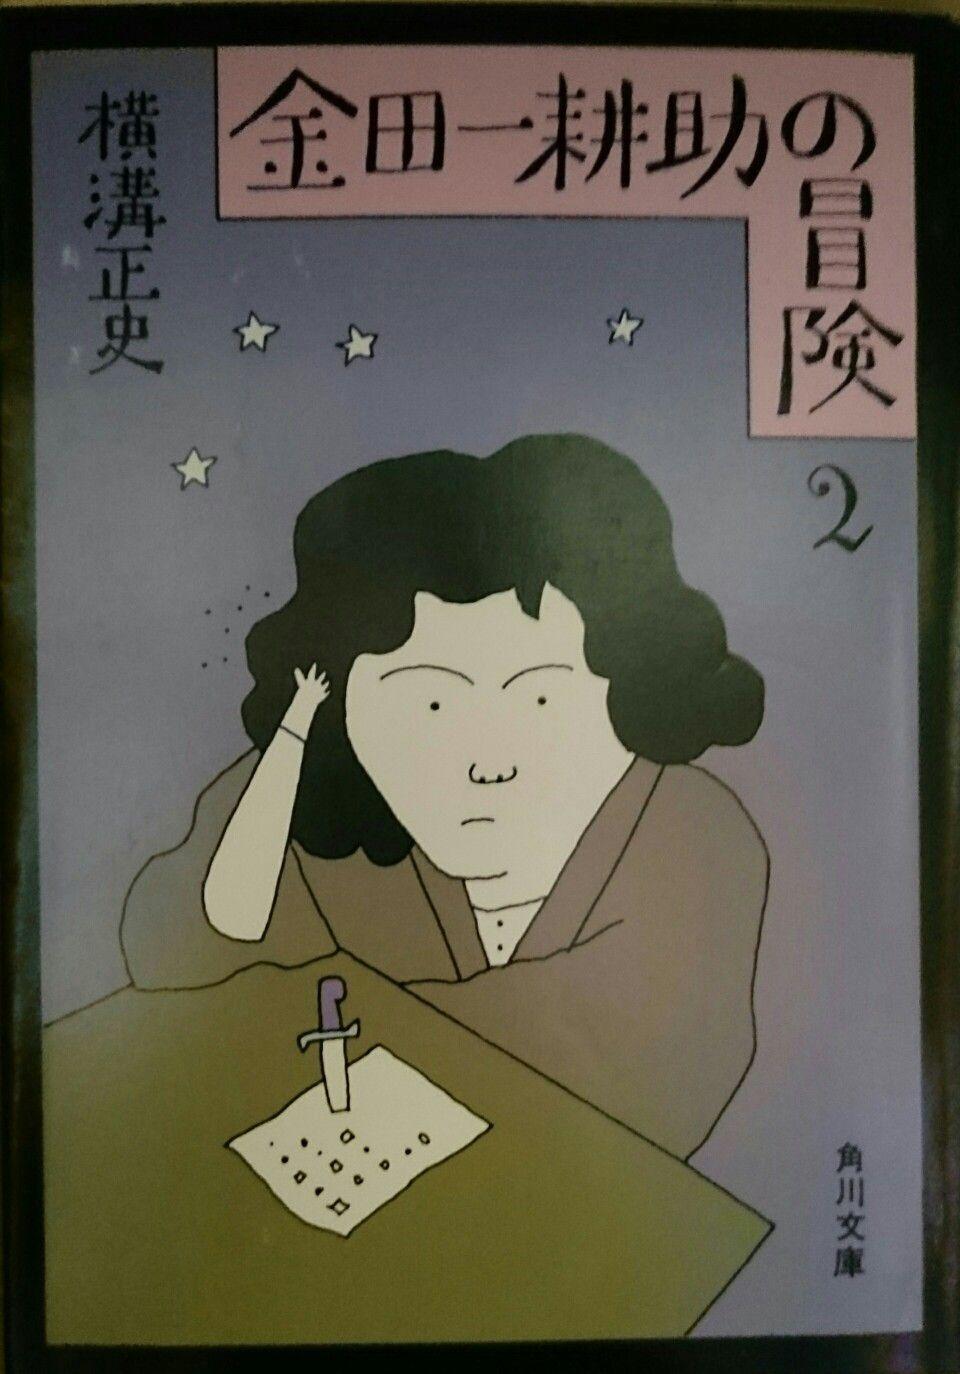 角川書店 横溝正史文庫 65 金田一耕助の冒険2表紙 イラスト和田誠